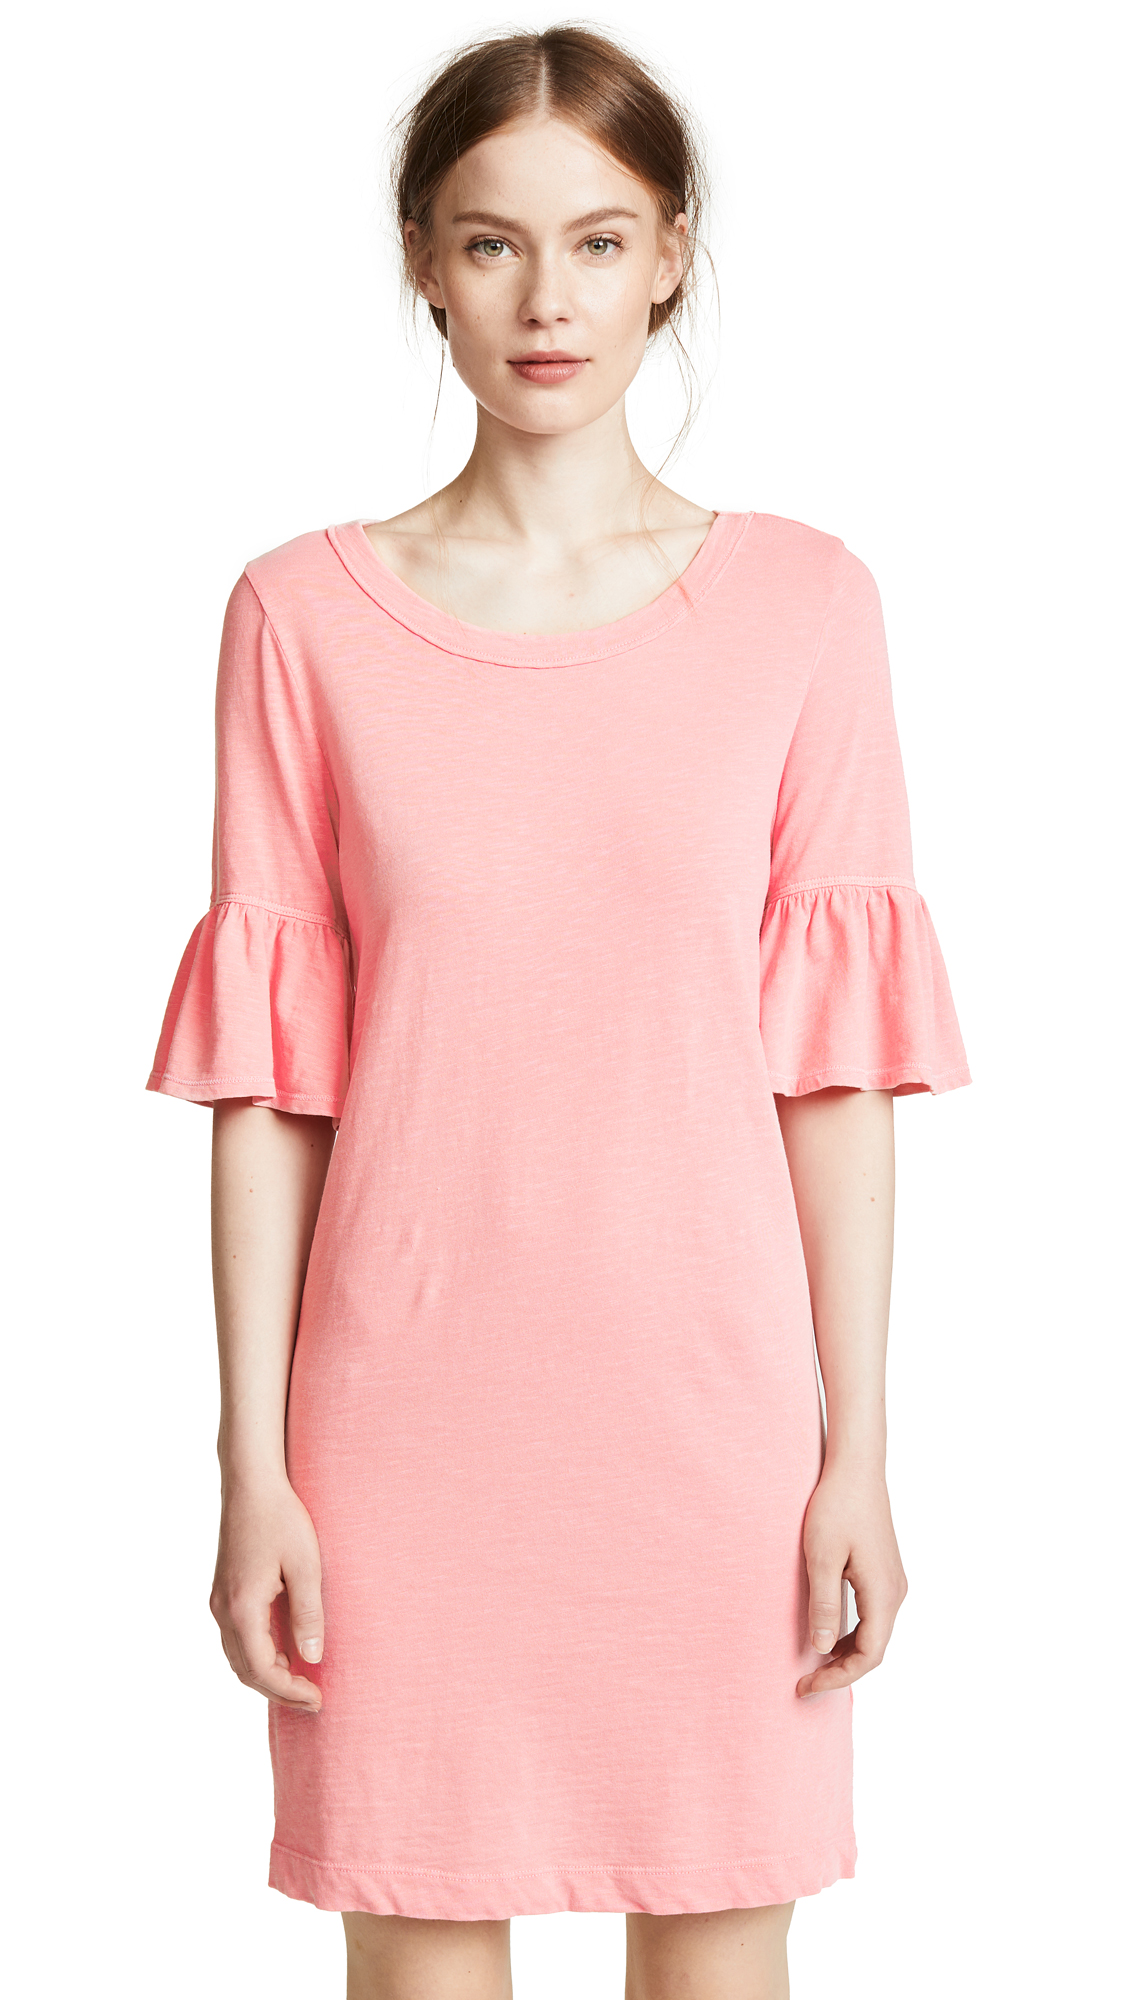 Splendid Ruffle Sleeve Tee Dress online sales